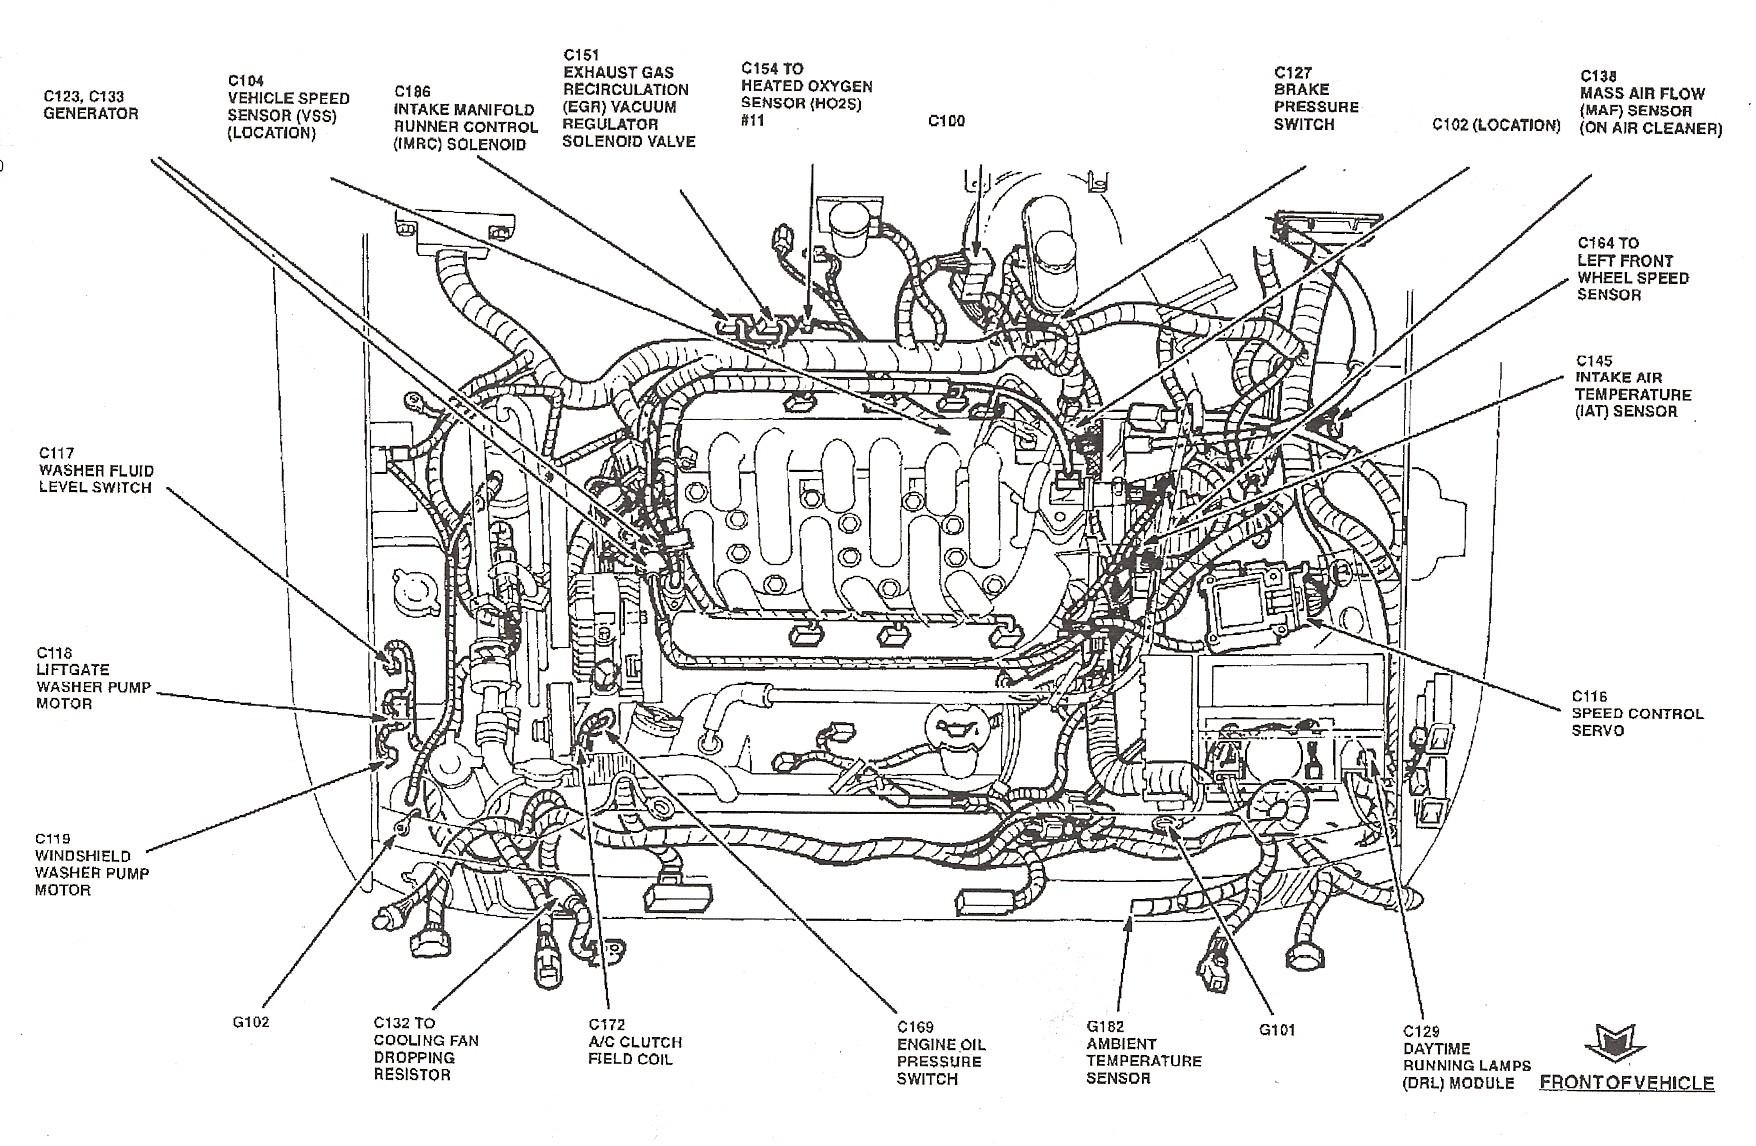 2000 ford Explorer Parts Diagram 2000 ford Windstar Wiring Diagram Blurts Of 2000 ford Explorer Parts Diagram